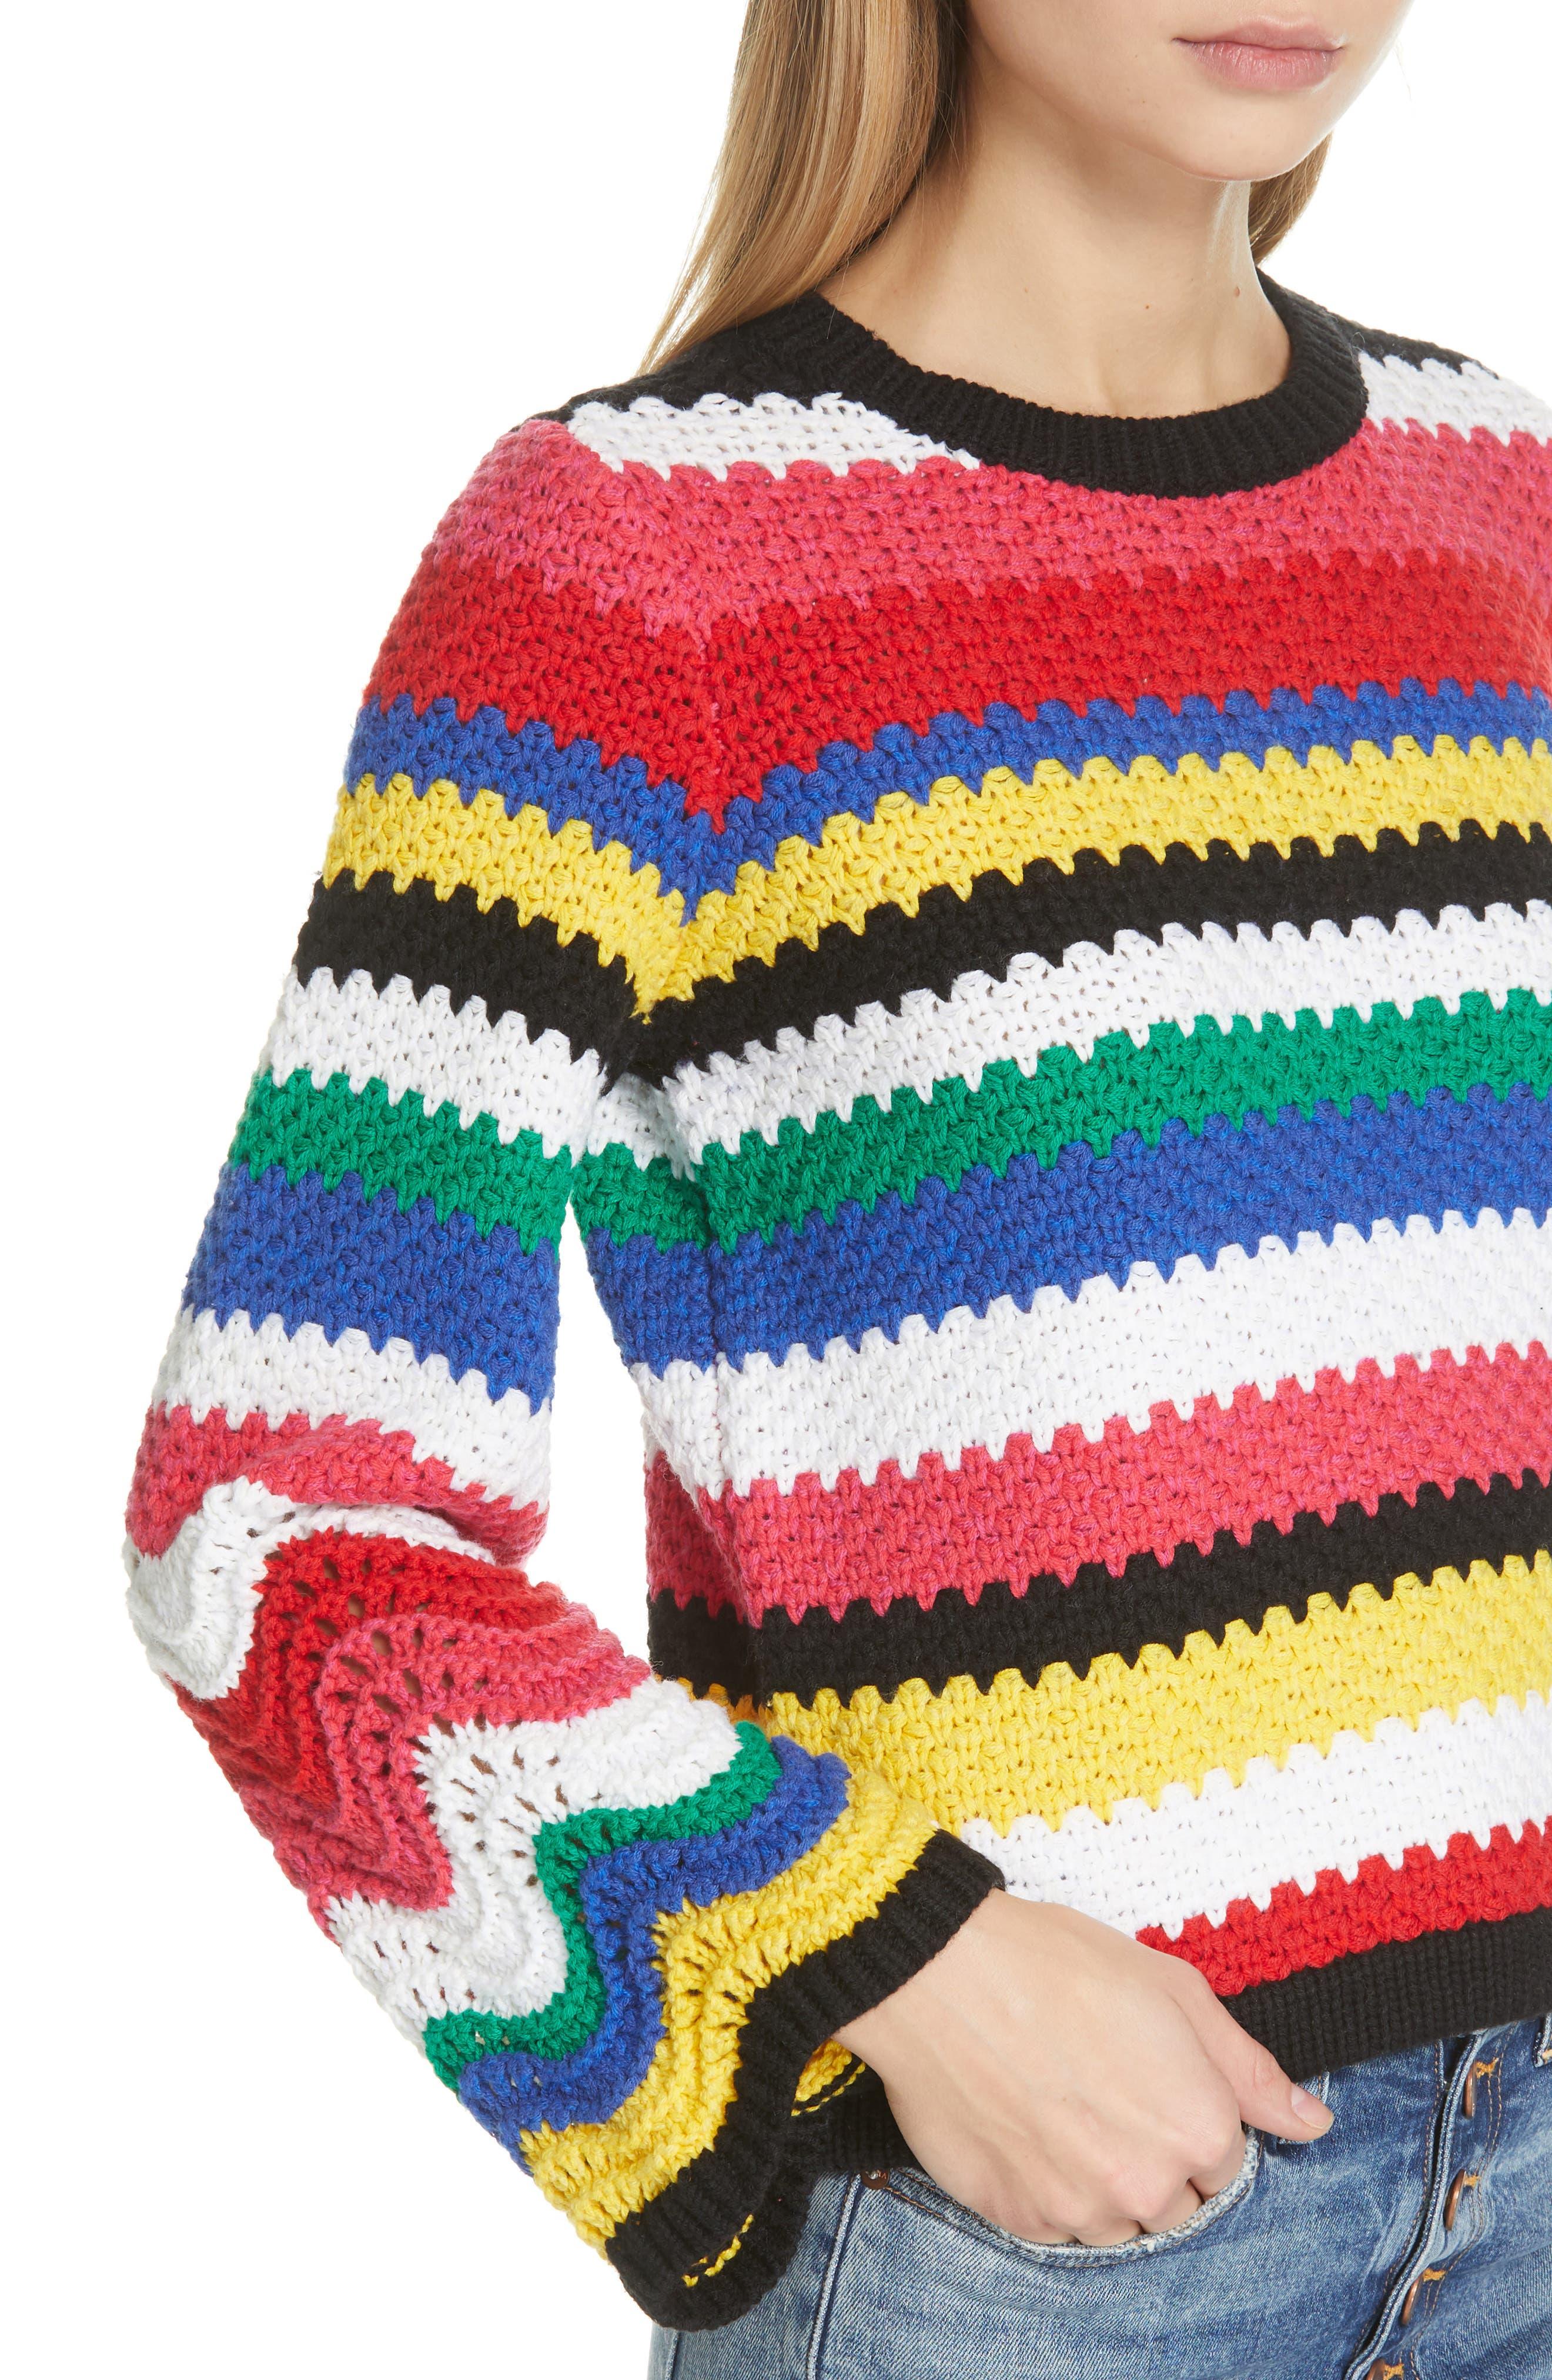 ALICE + OLIVIA, Alivia Stripe Bell Sleeve Cotton Blend Sweater, Alternate thumbnail 4, color, MULTI